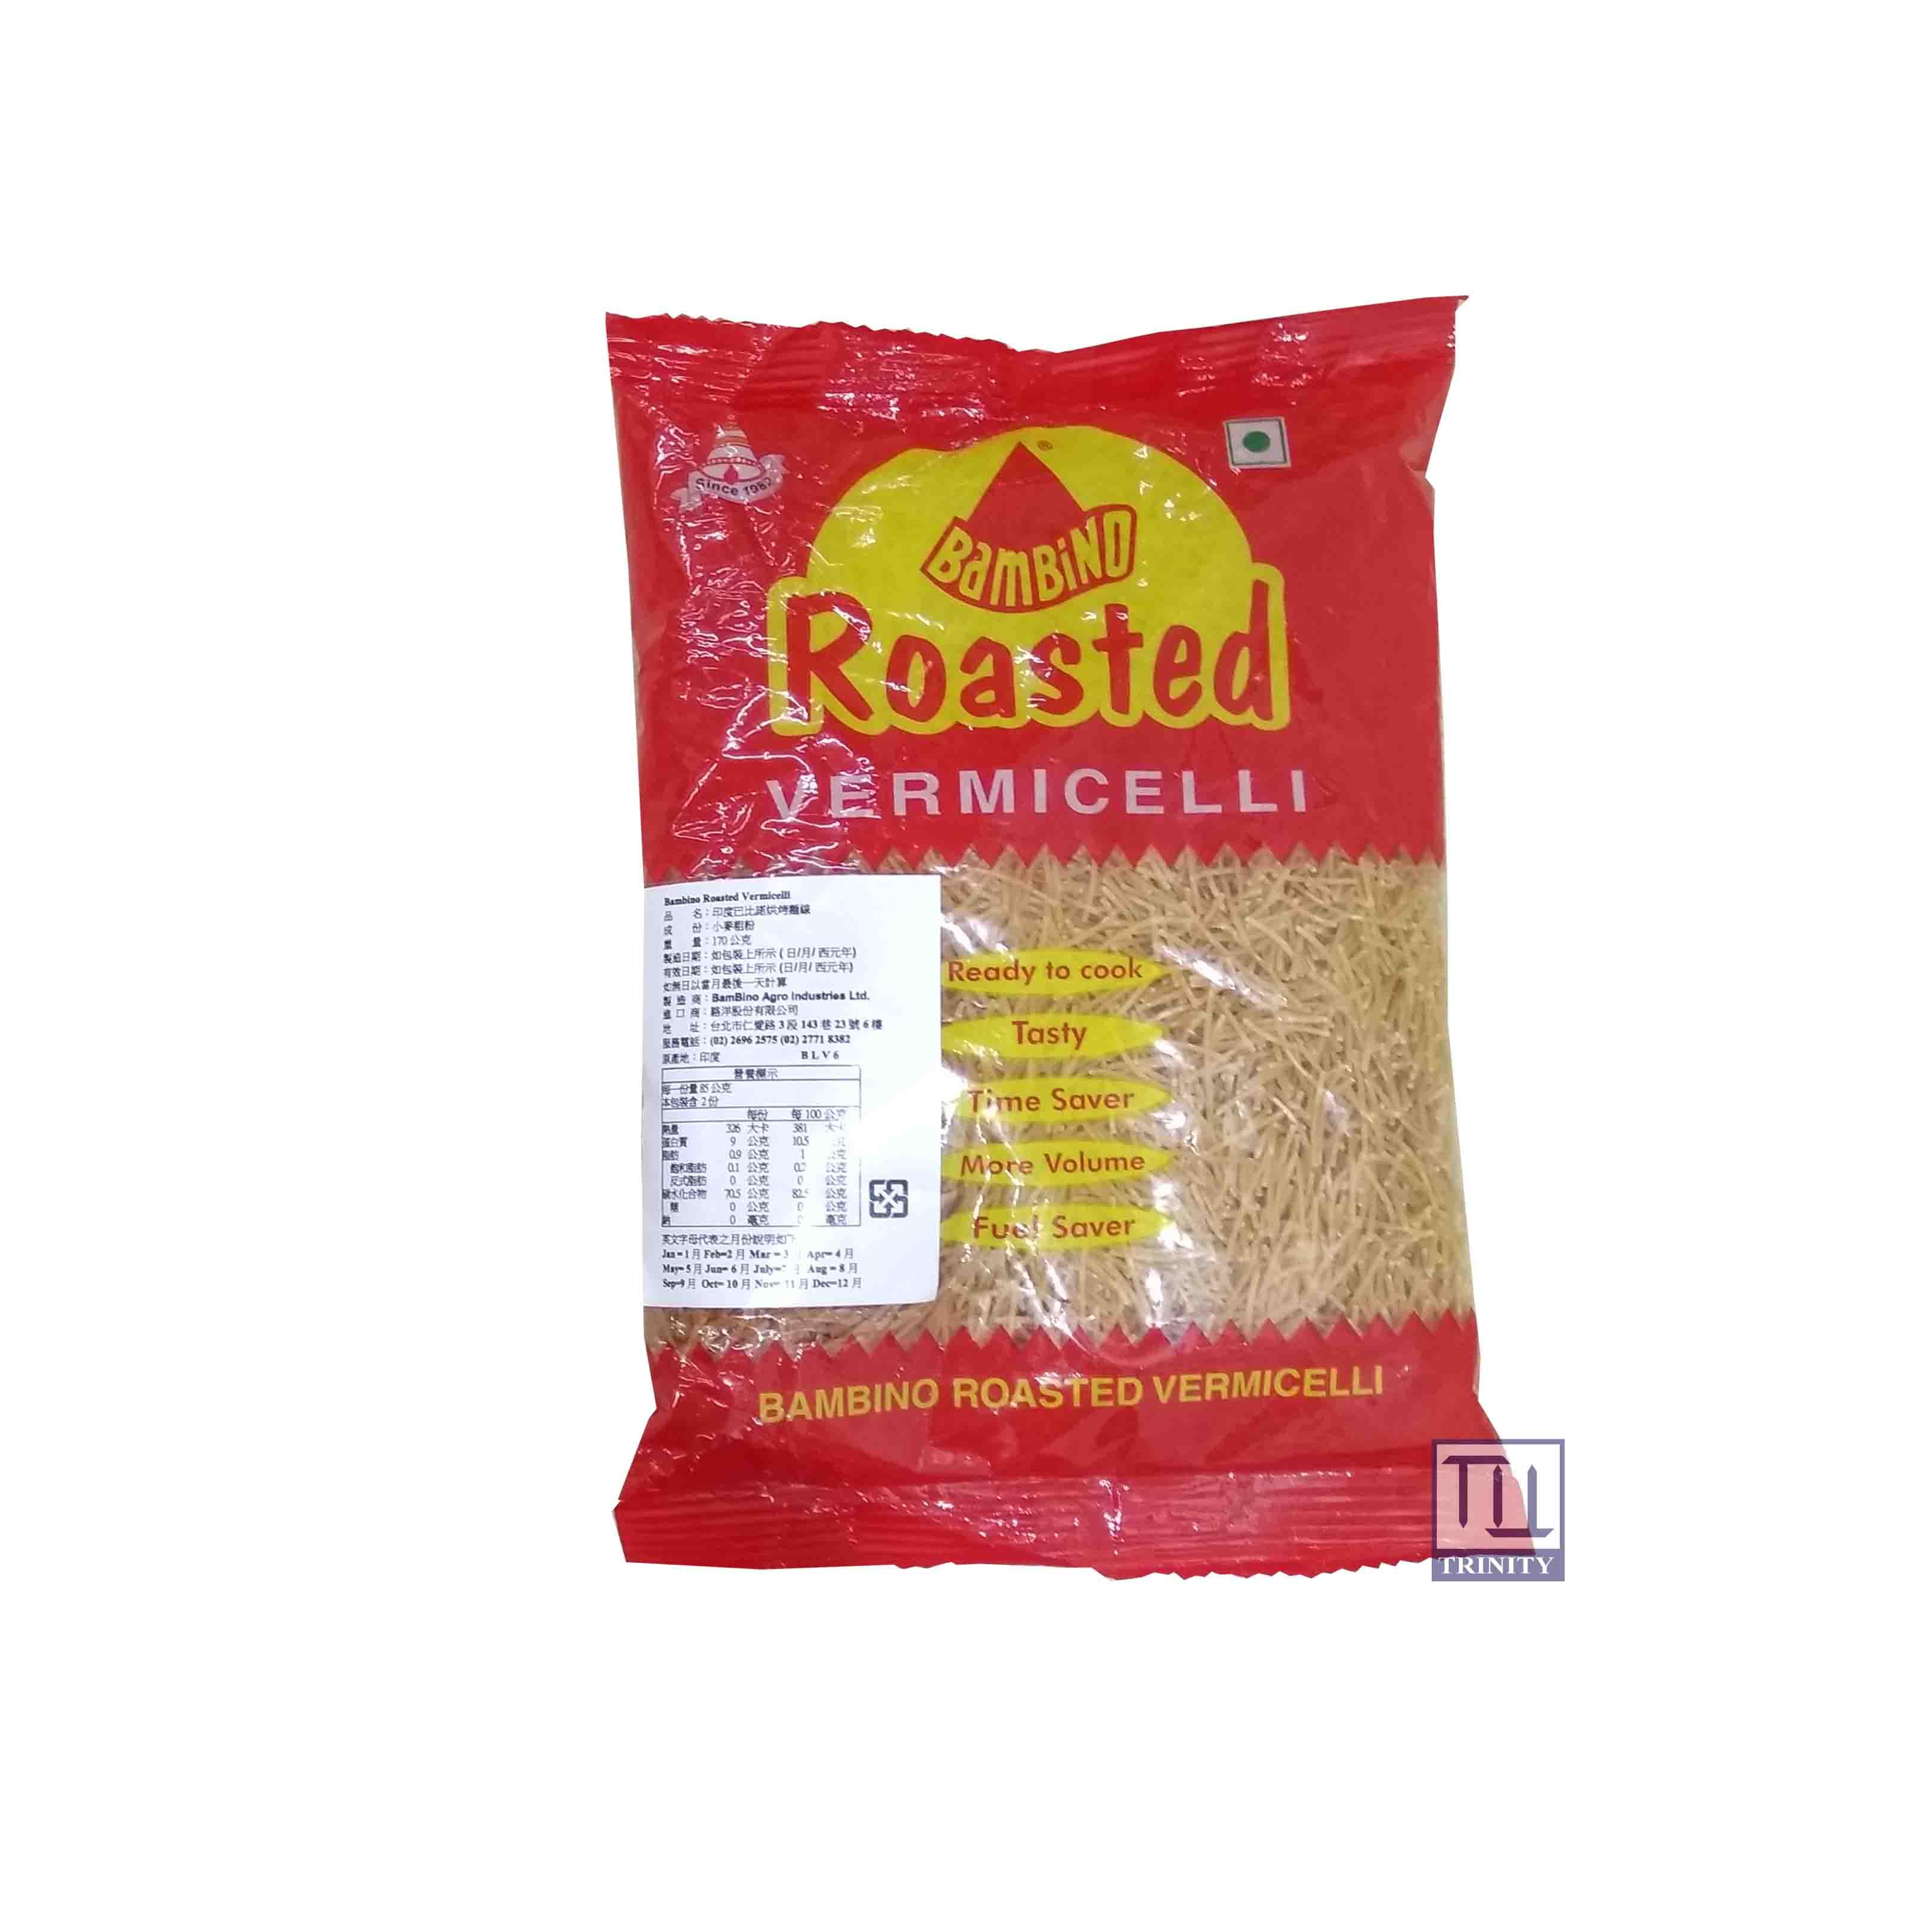 Bambino Roasted Vermicelli 印度巴比諾烘烤麵線